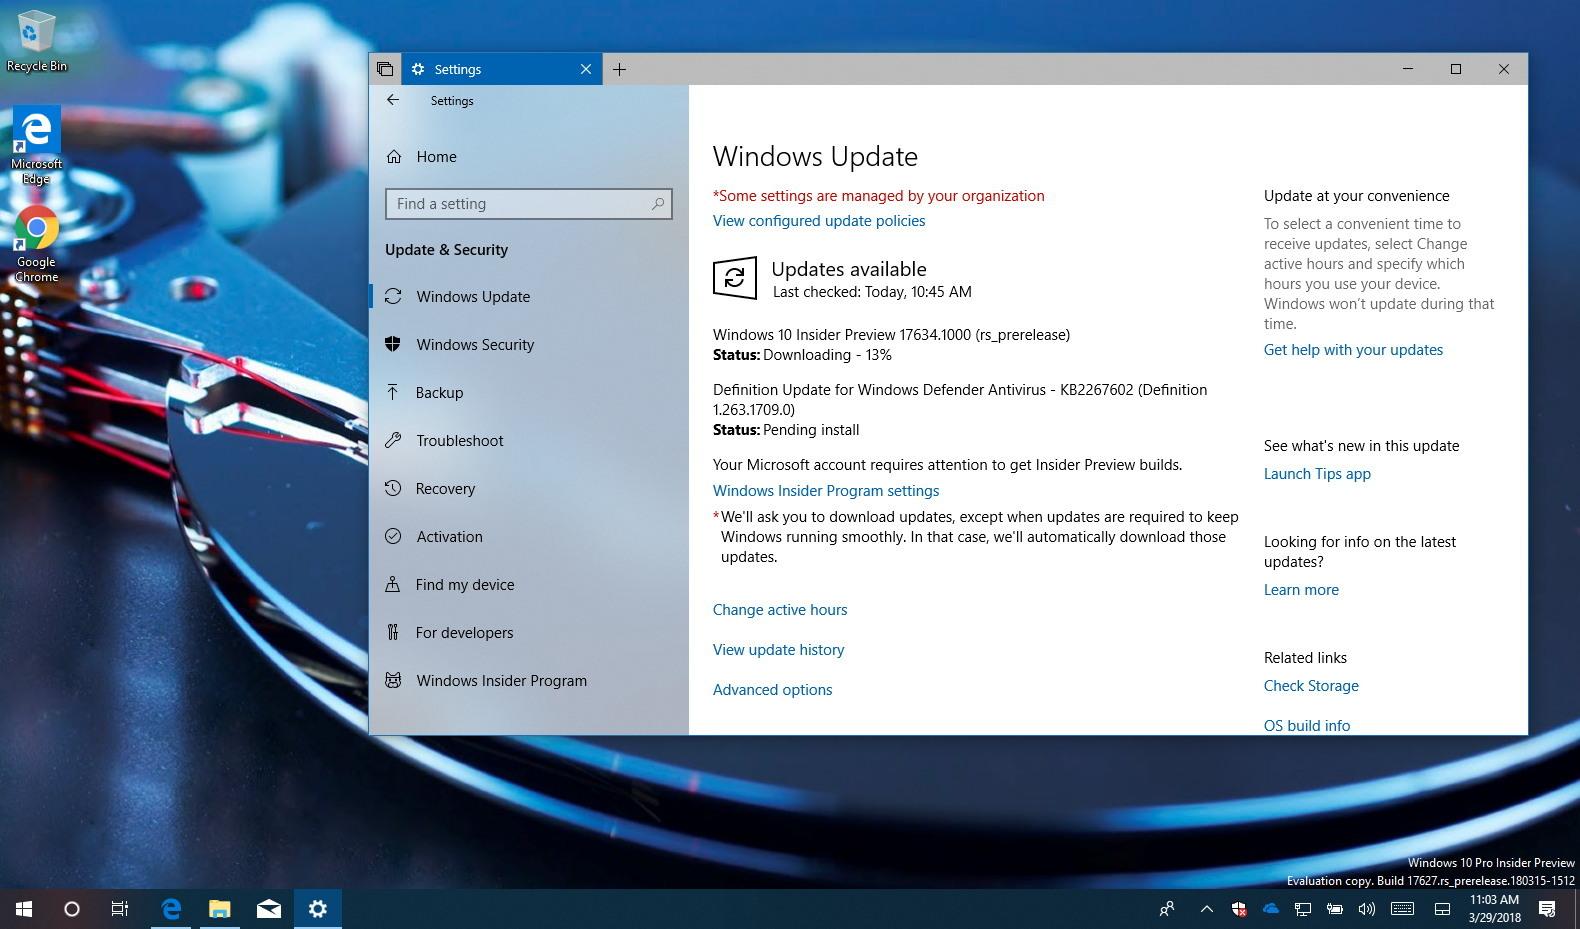 Windows 10 build 17634